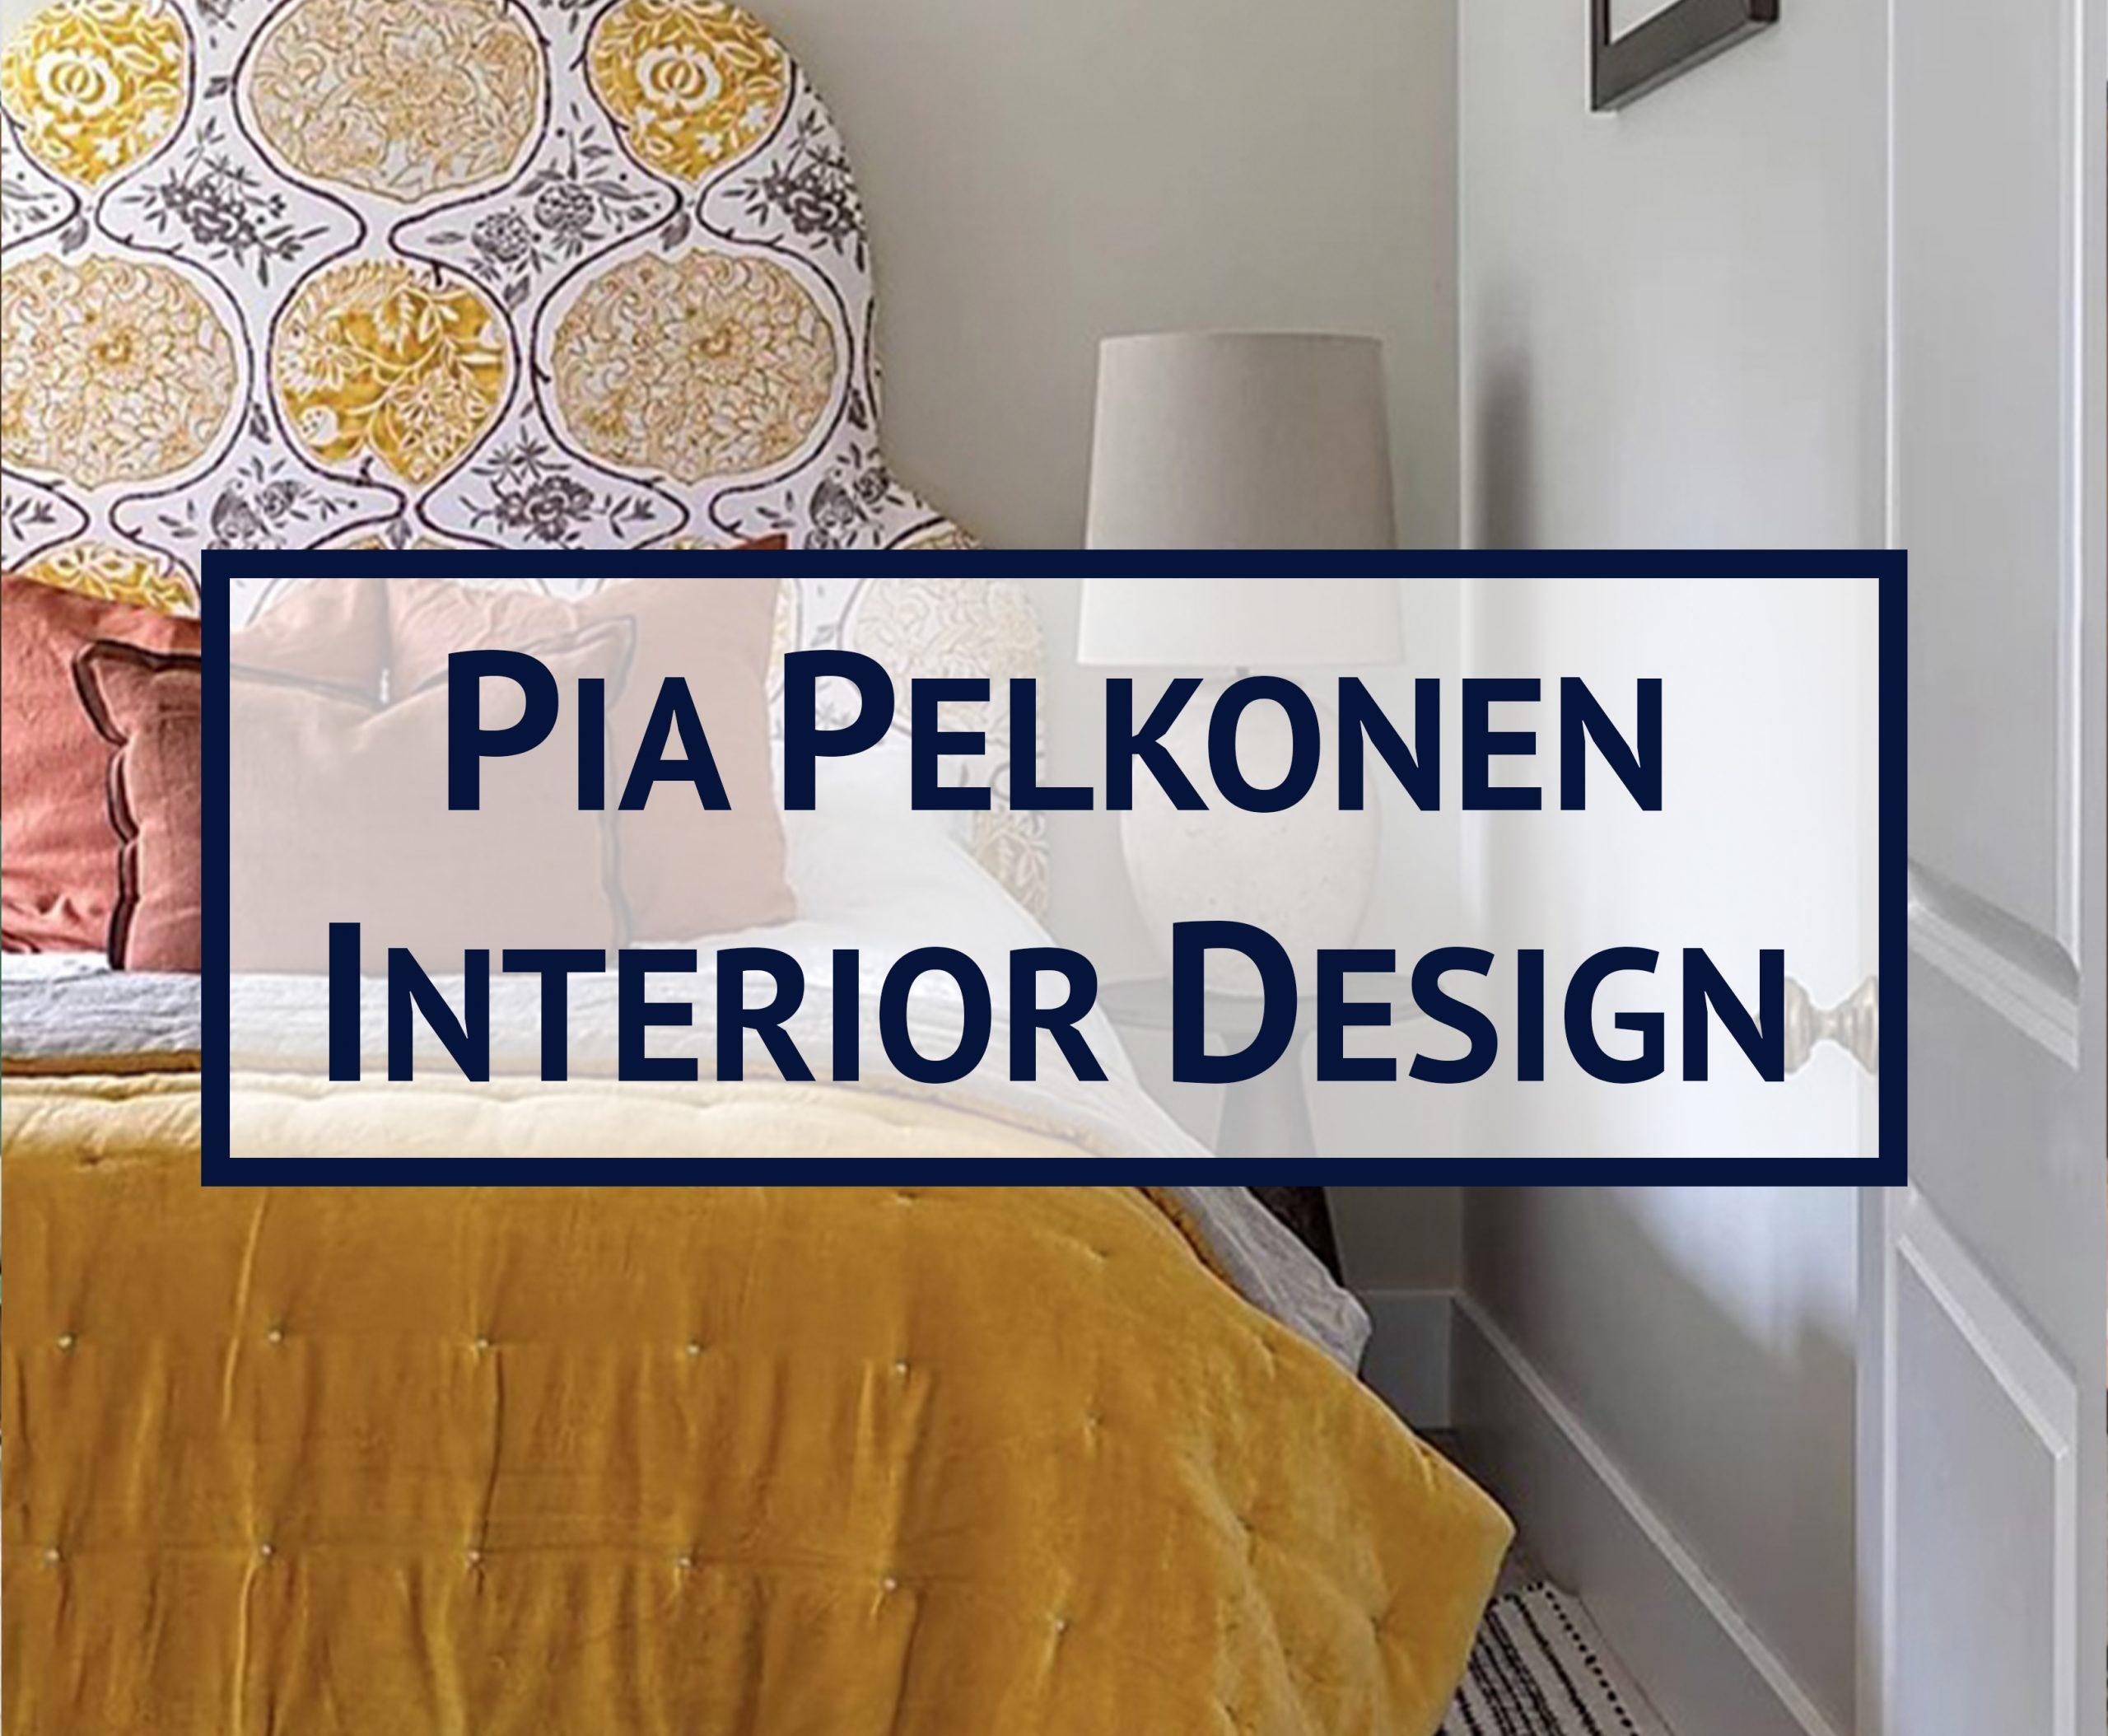 Pia Pelkonen Interior Design